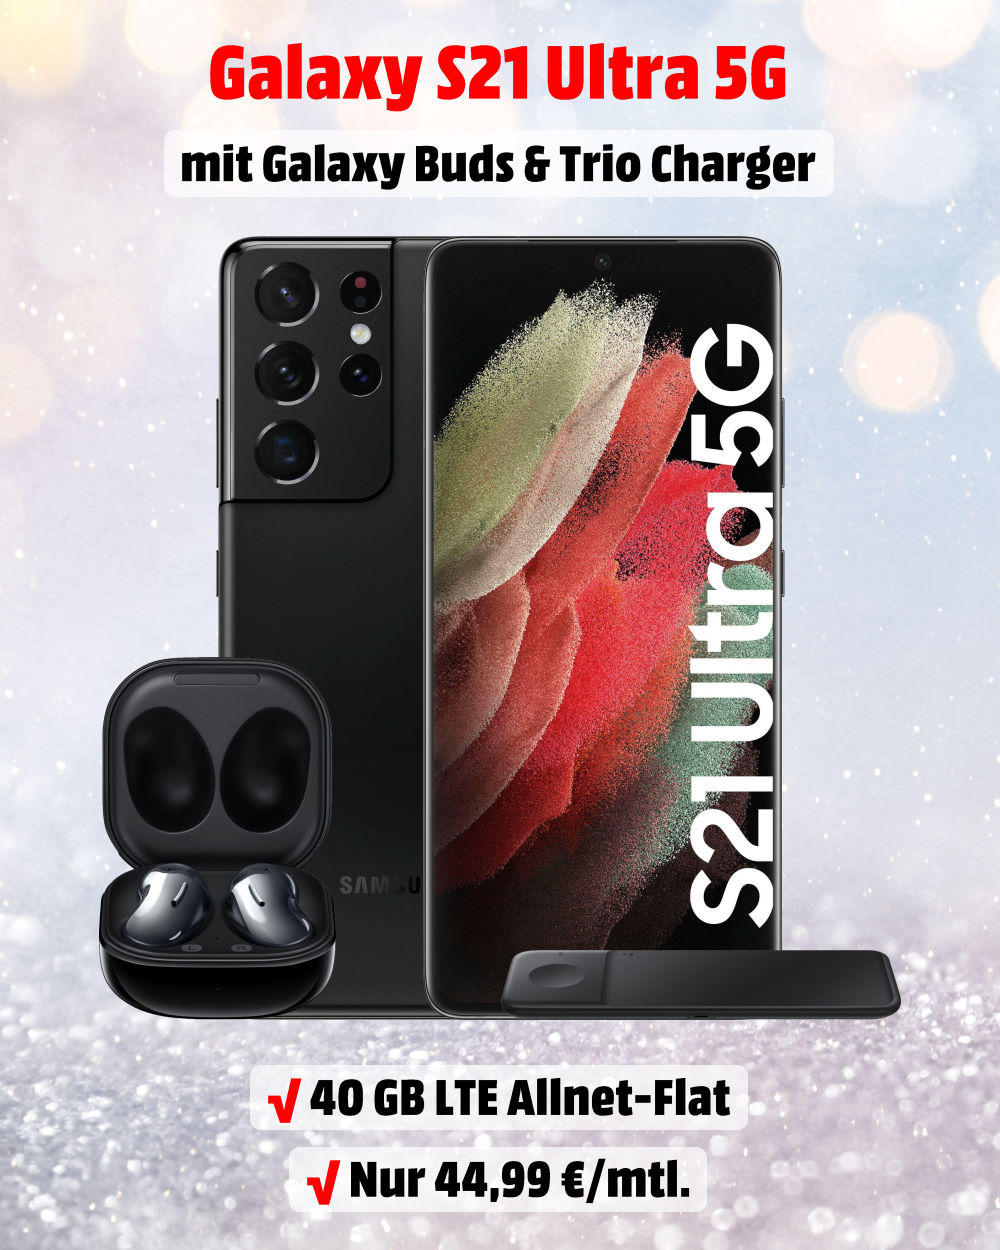 Galaxy S21 Ultra 5G Handyvertrag inkl. Galaxy Buds Live, Trio Charger und 40 GB LTE Allnet-Flat